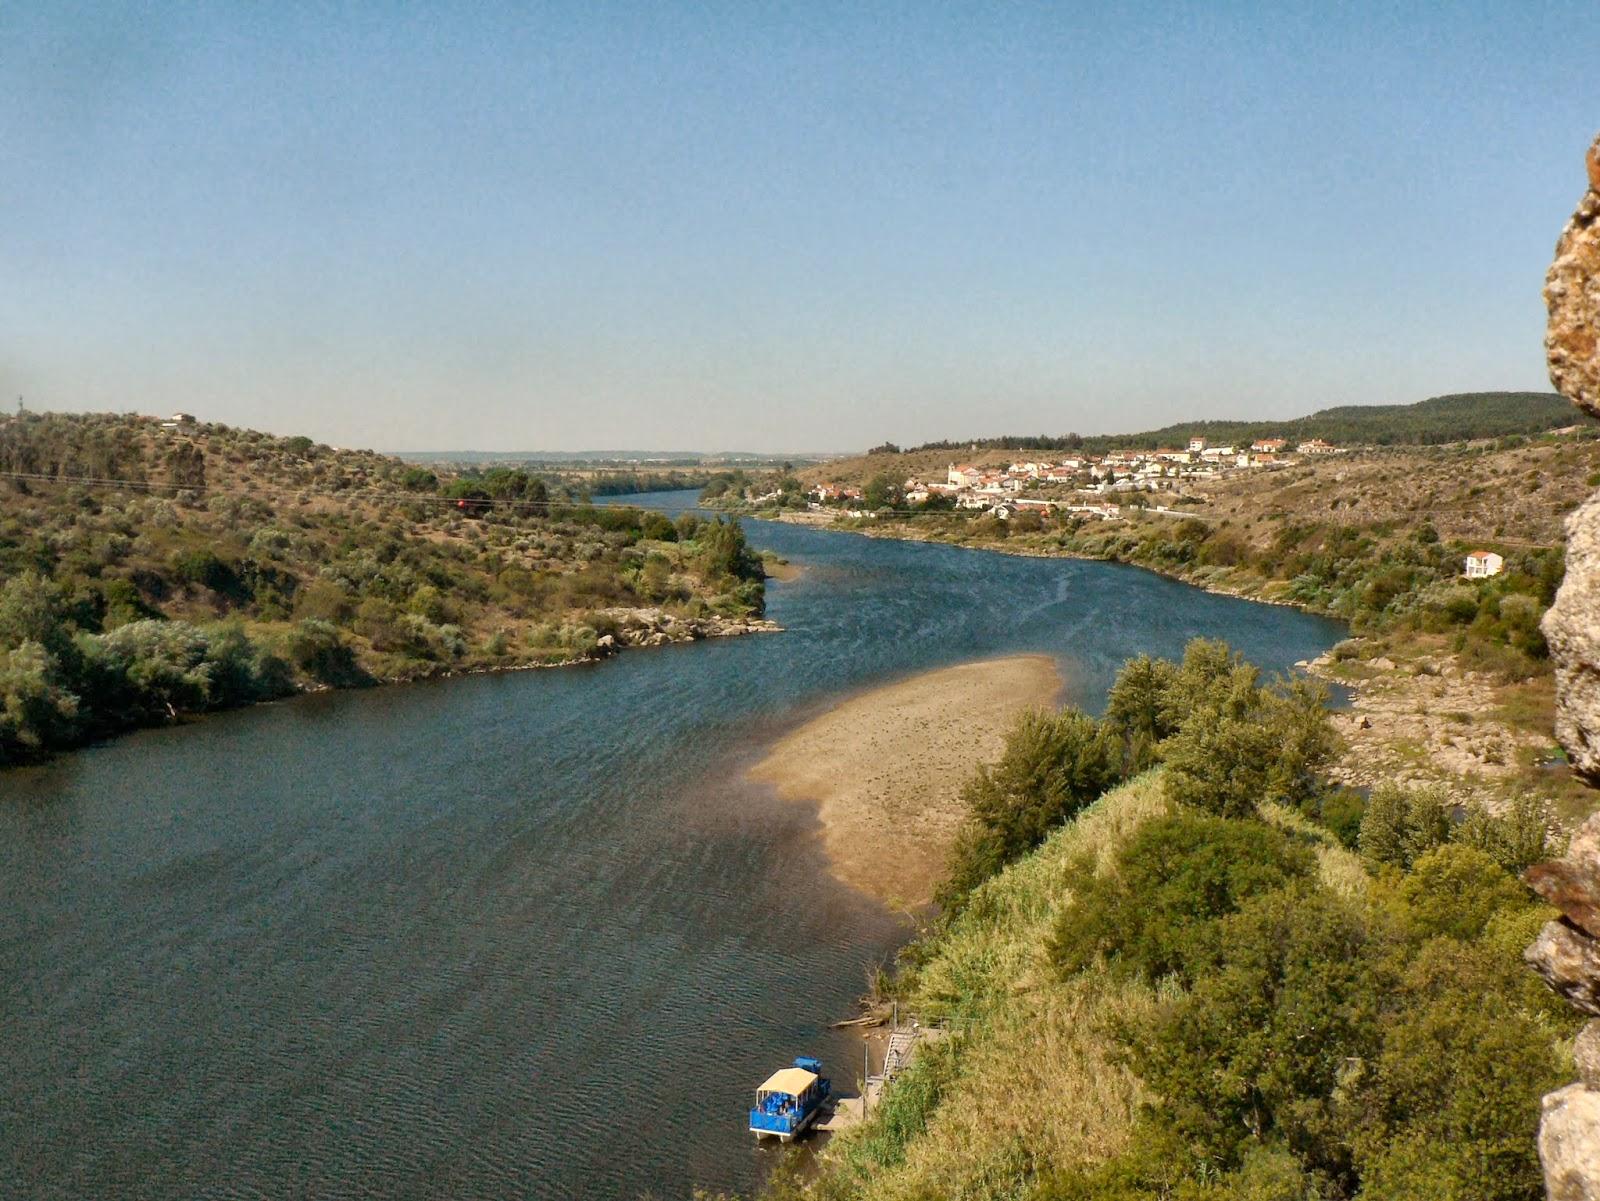 Rio Tejo, Rio da Espanha e Portugal